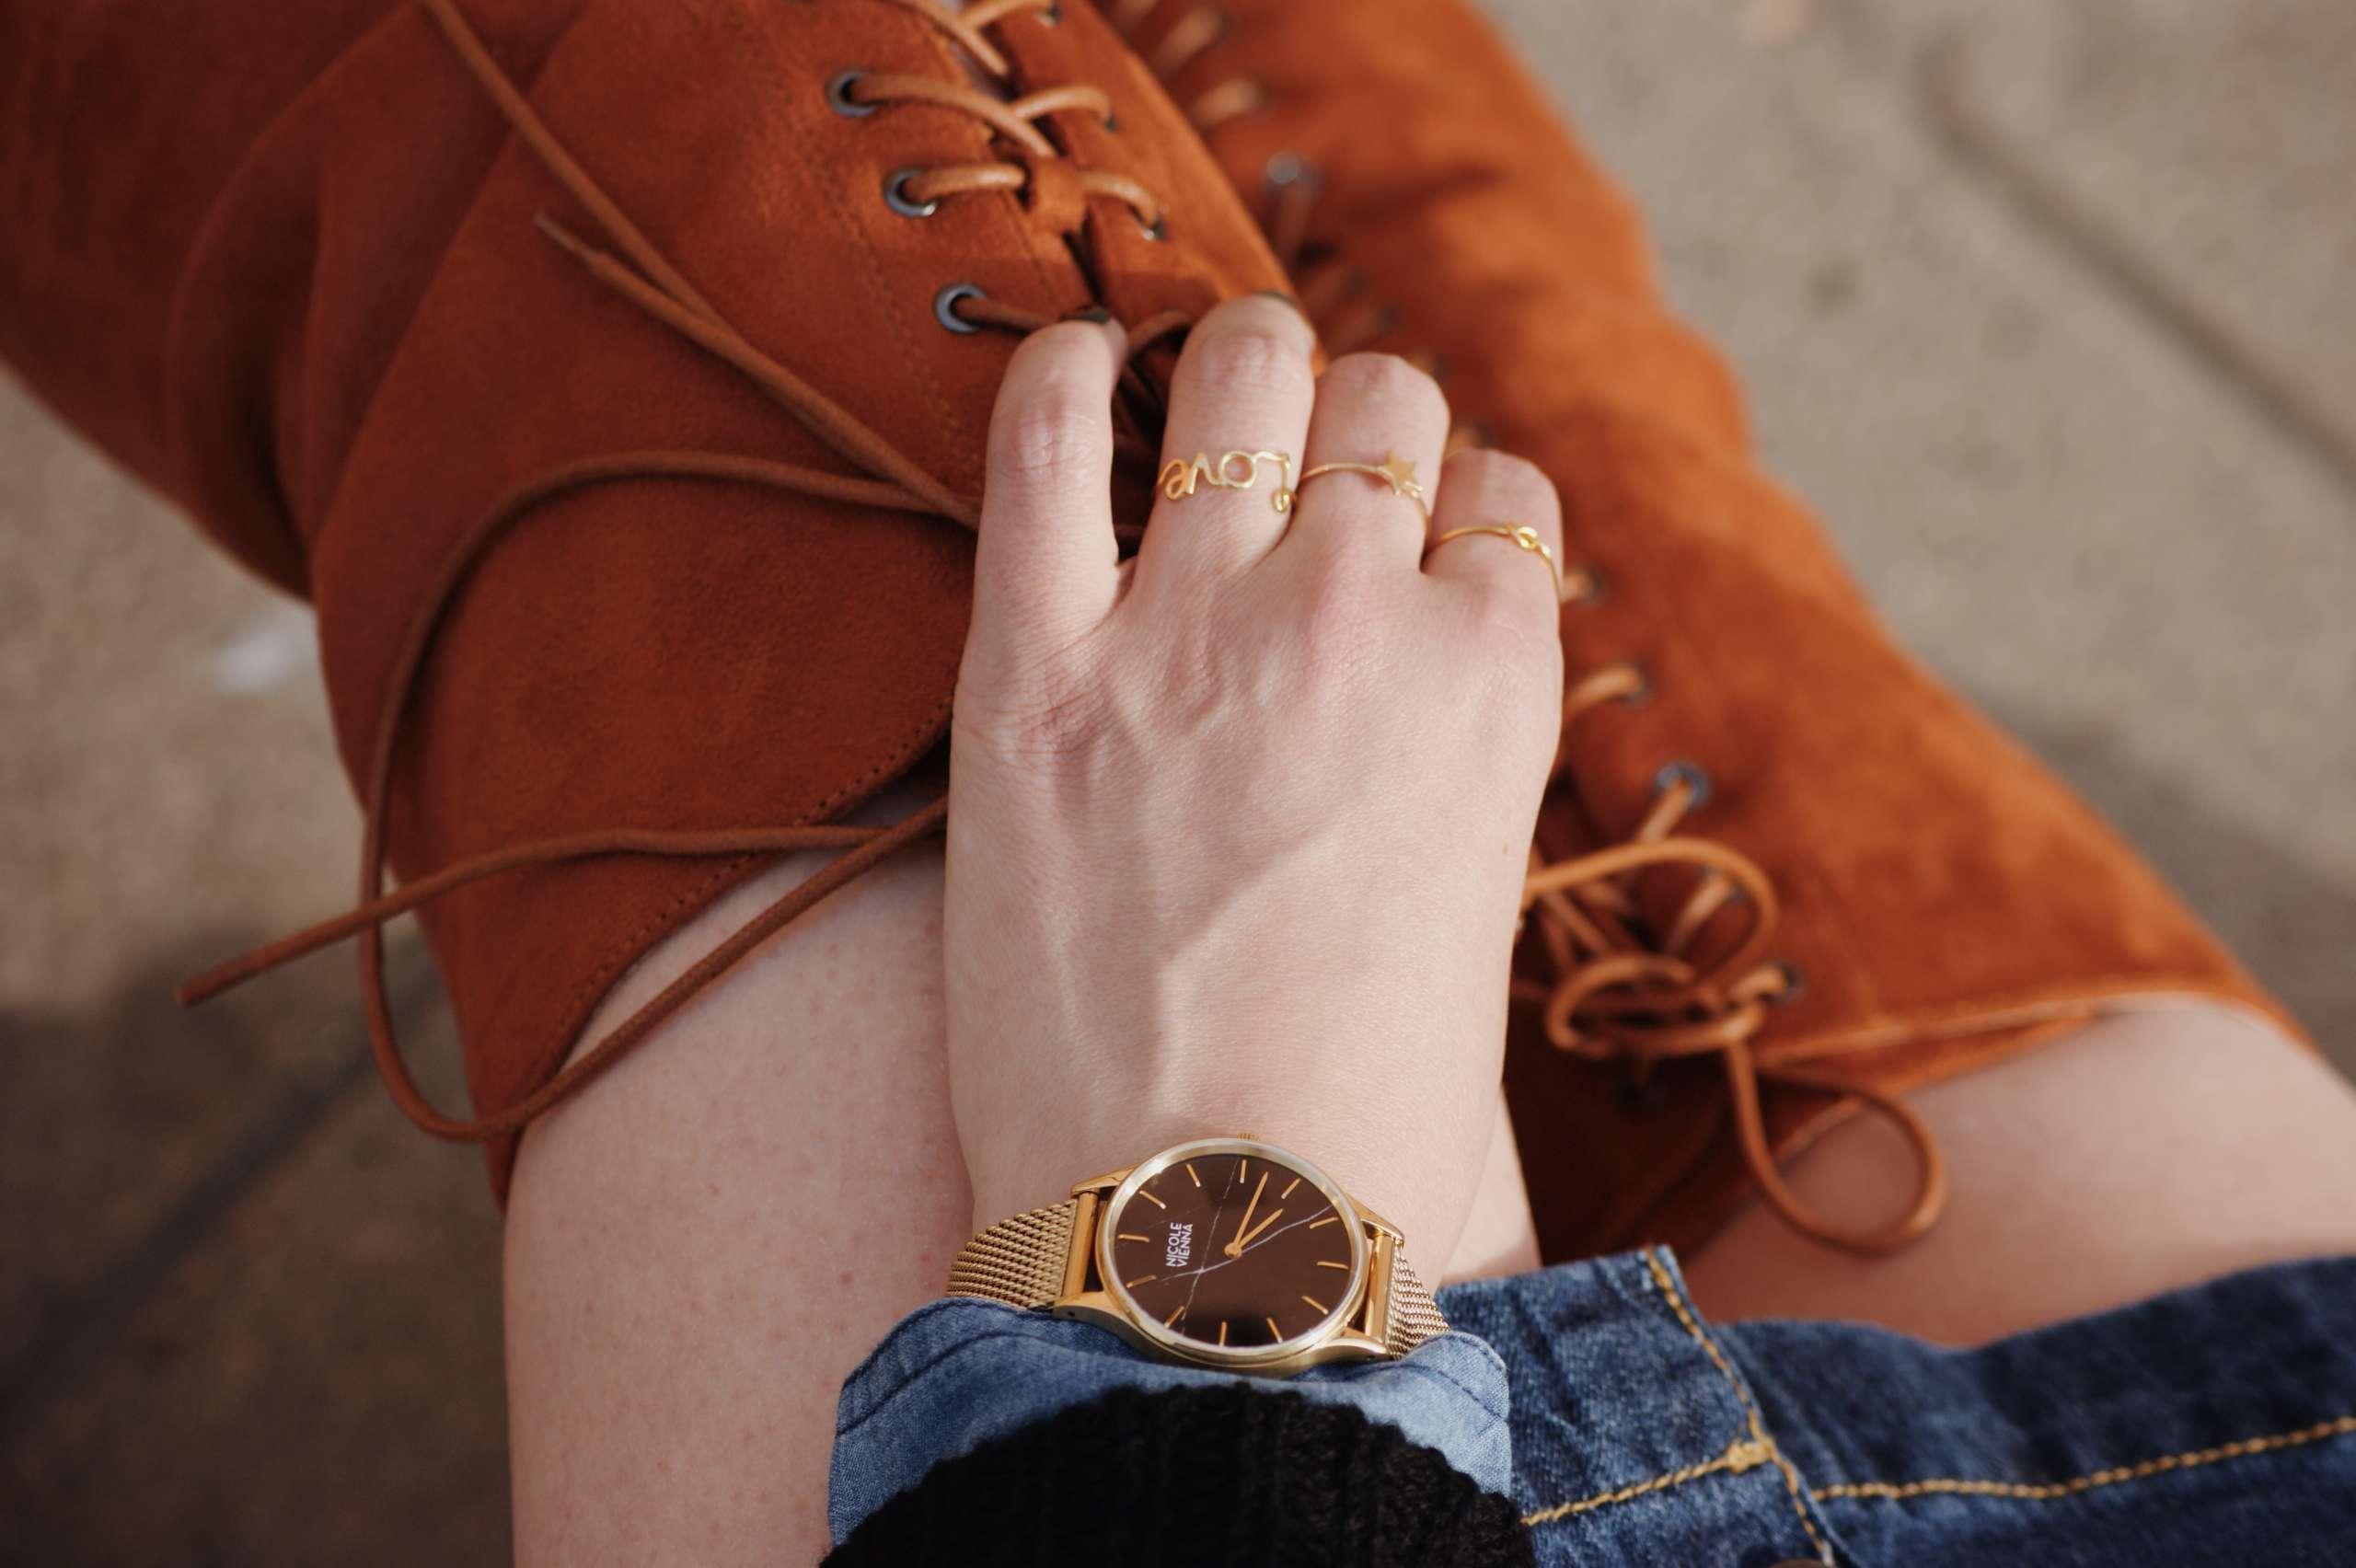 A-line-denim-skirt-denim-on-denim-denim-shirt-dricoper-gucci-knot-ring-laura-gravestock-love-ring-nicole-vienna-OVER-THE-KNEE-BOOTS-soho-leather-mini-chain-black-soir-n79-mesh-gold-star-ring-tan-suede